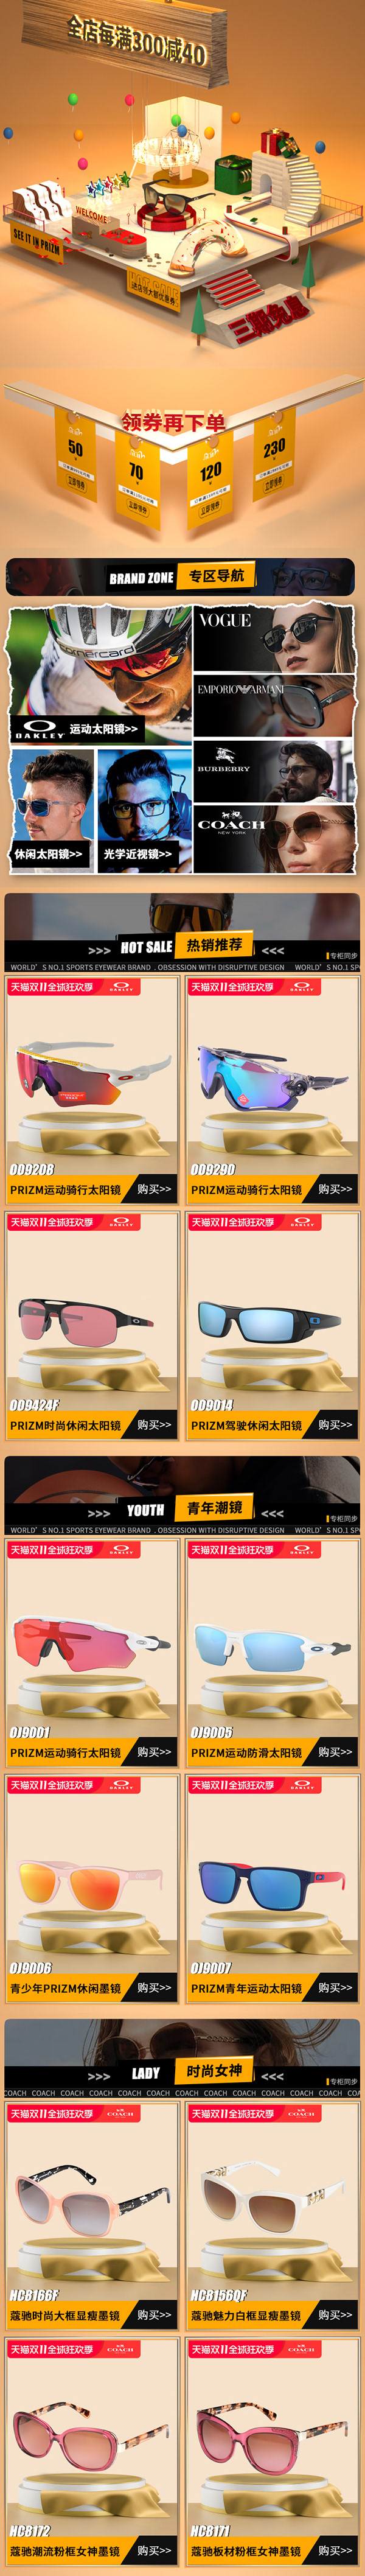 sunglass home page